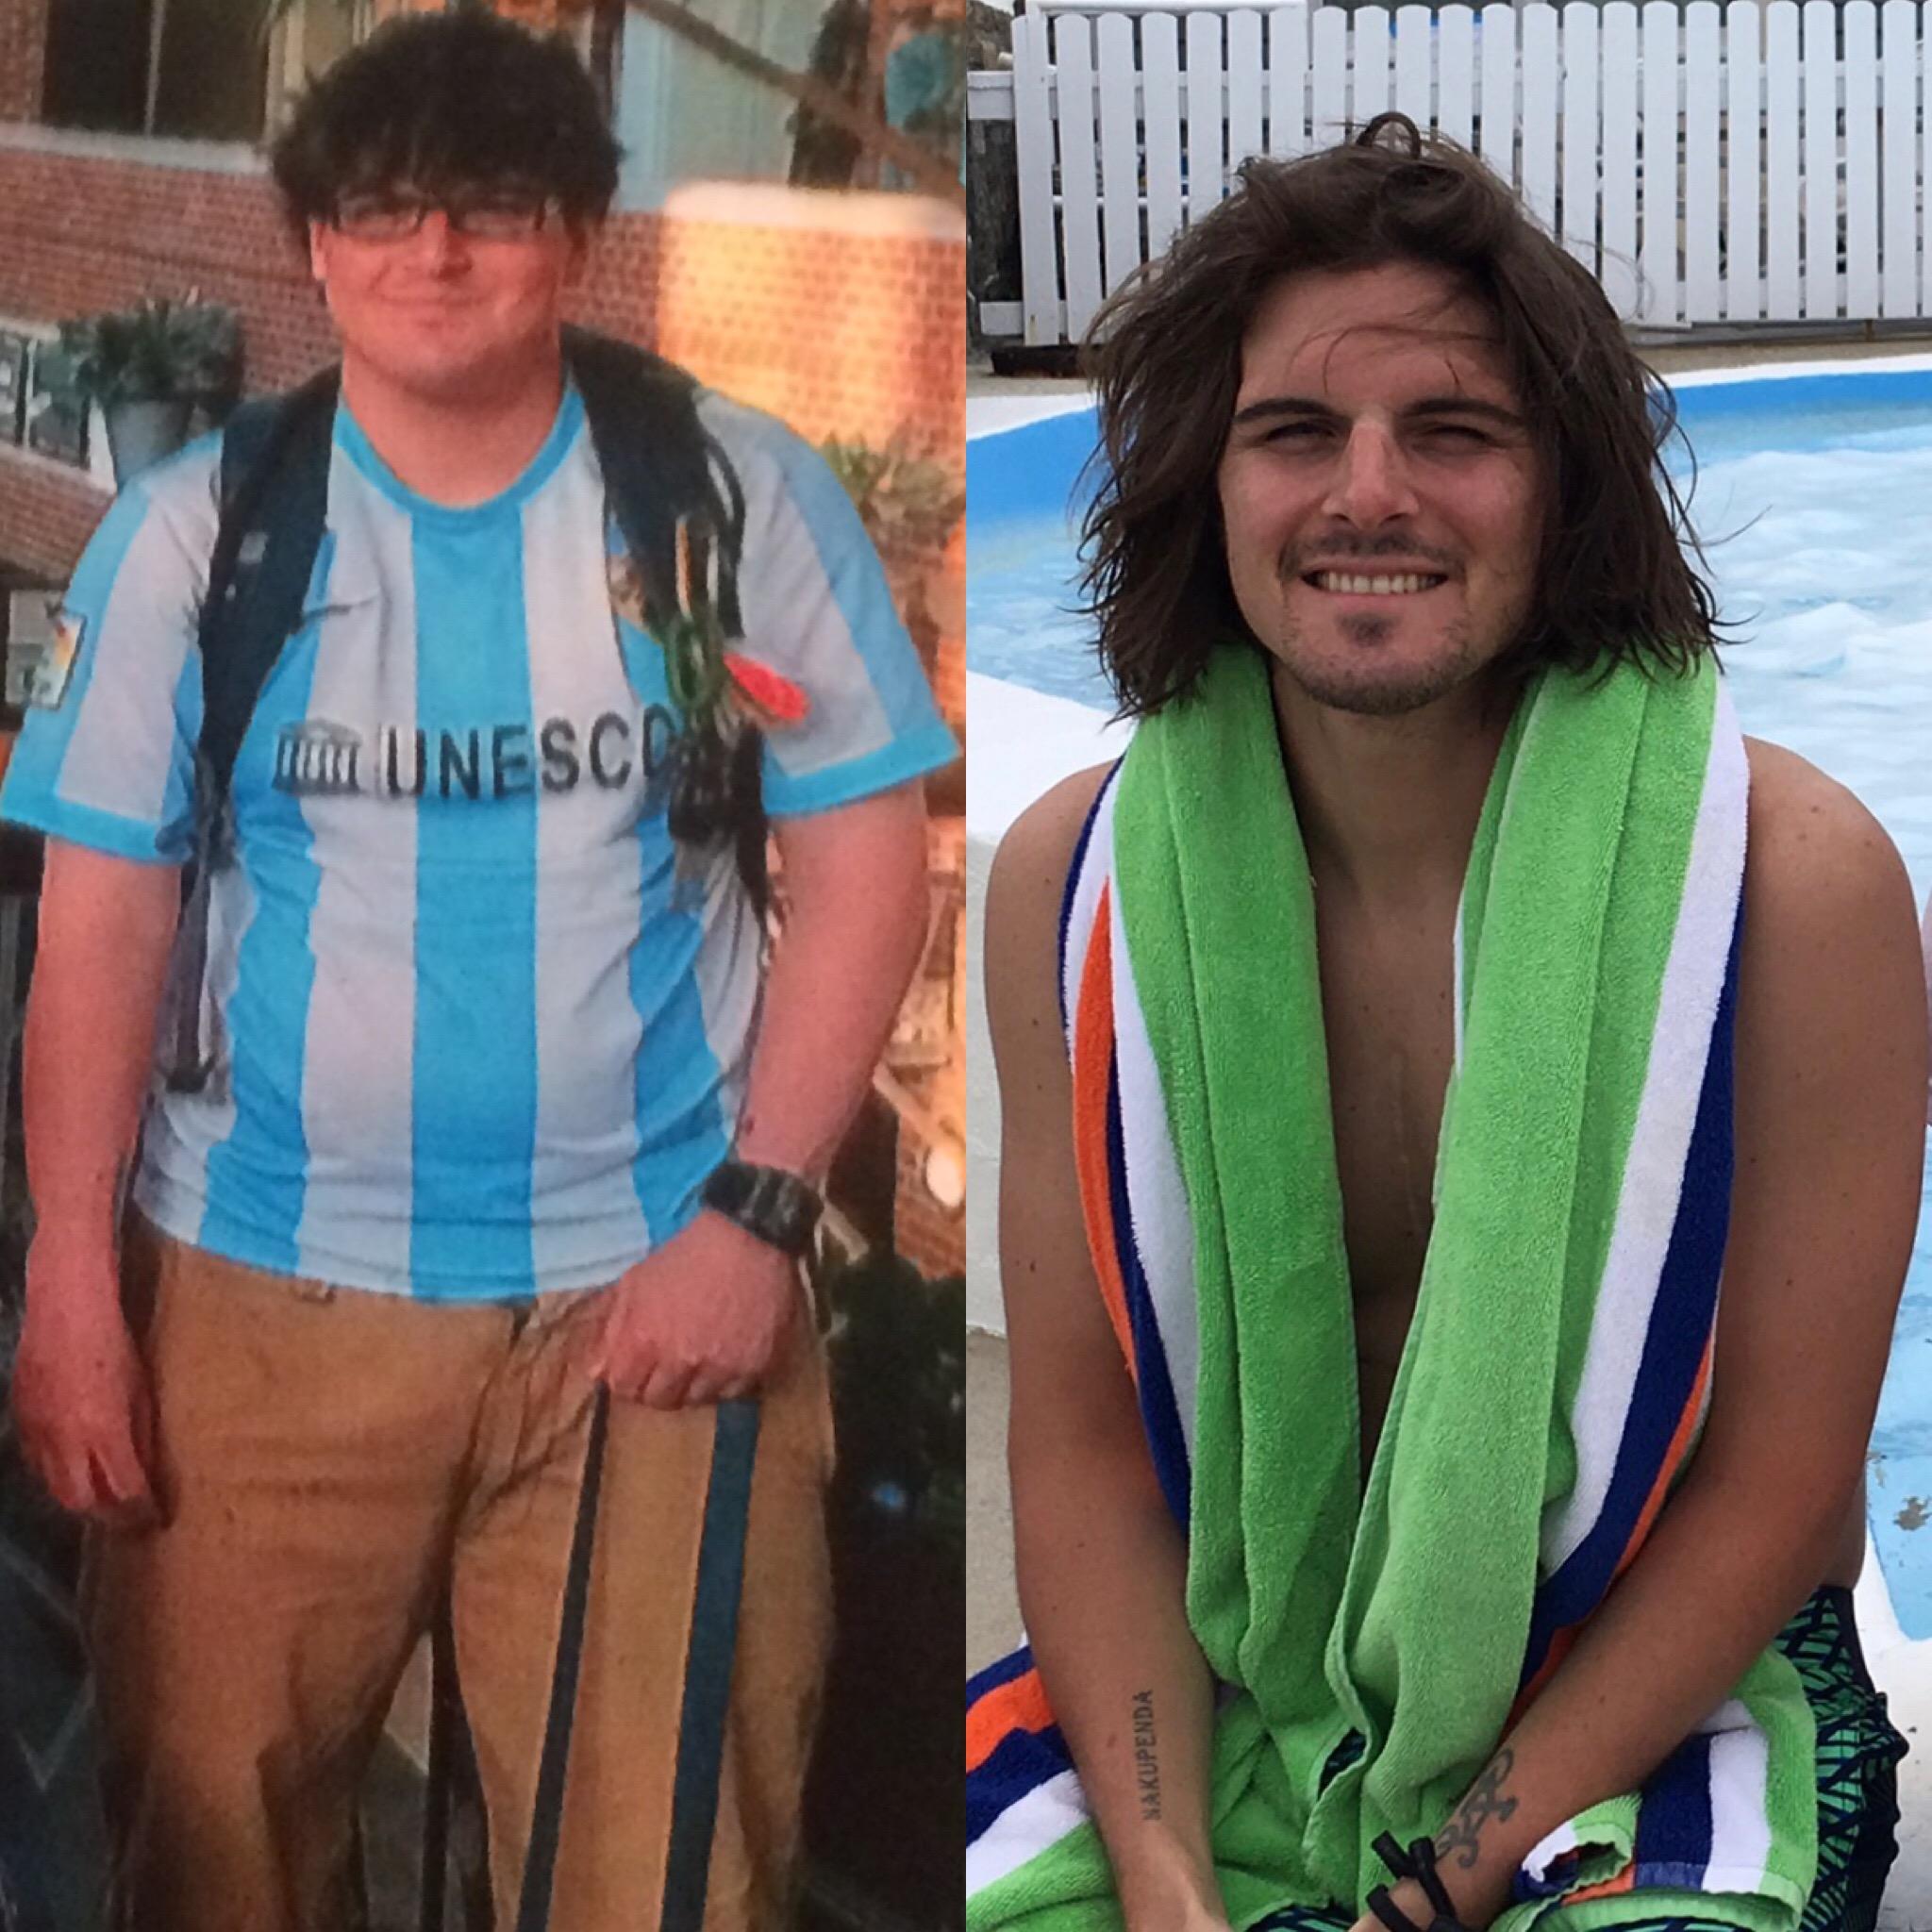 Patrick Kelly O2 Fitness Chapel Hill Transformation Weight Loss